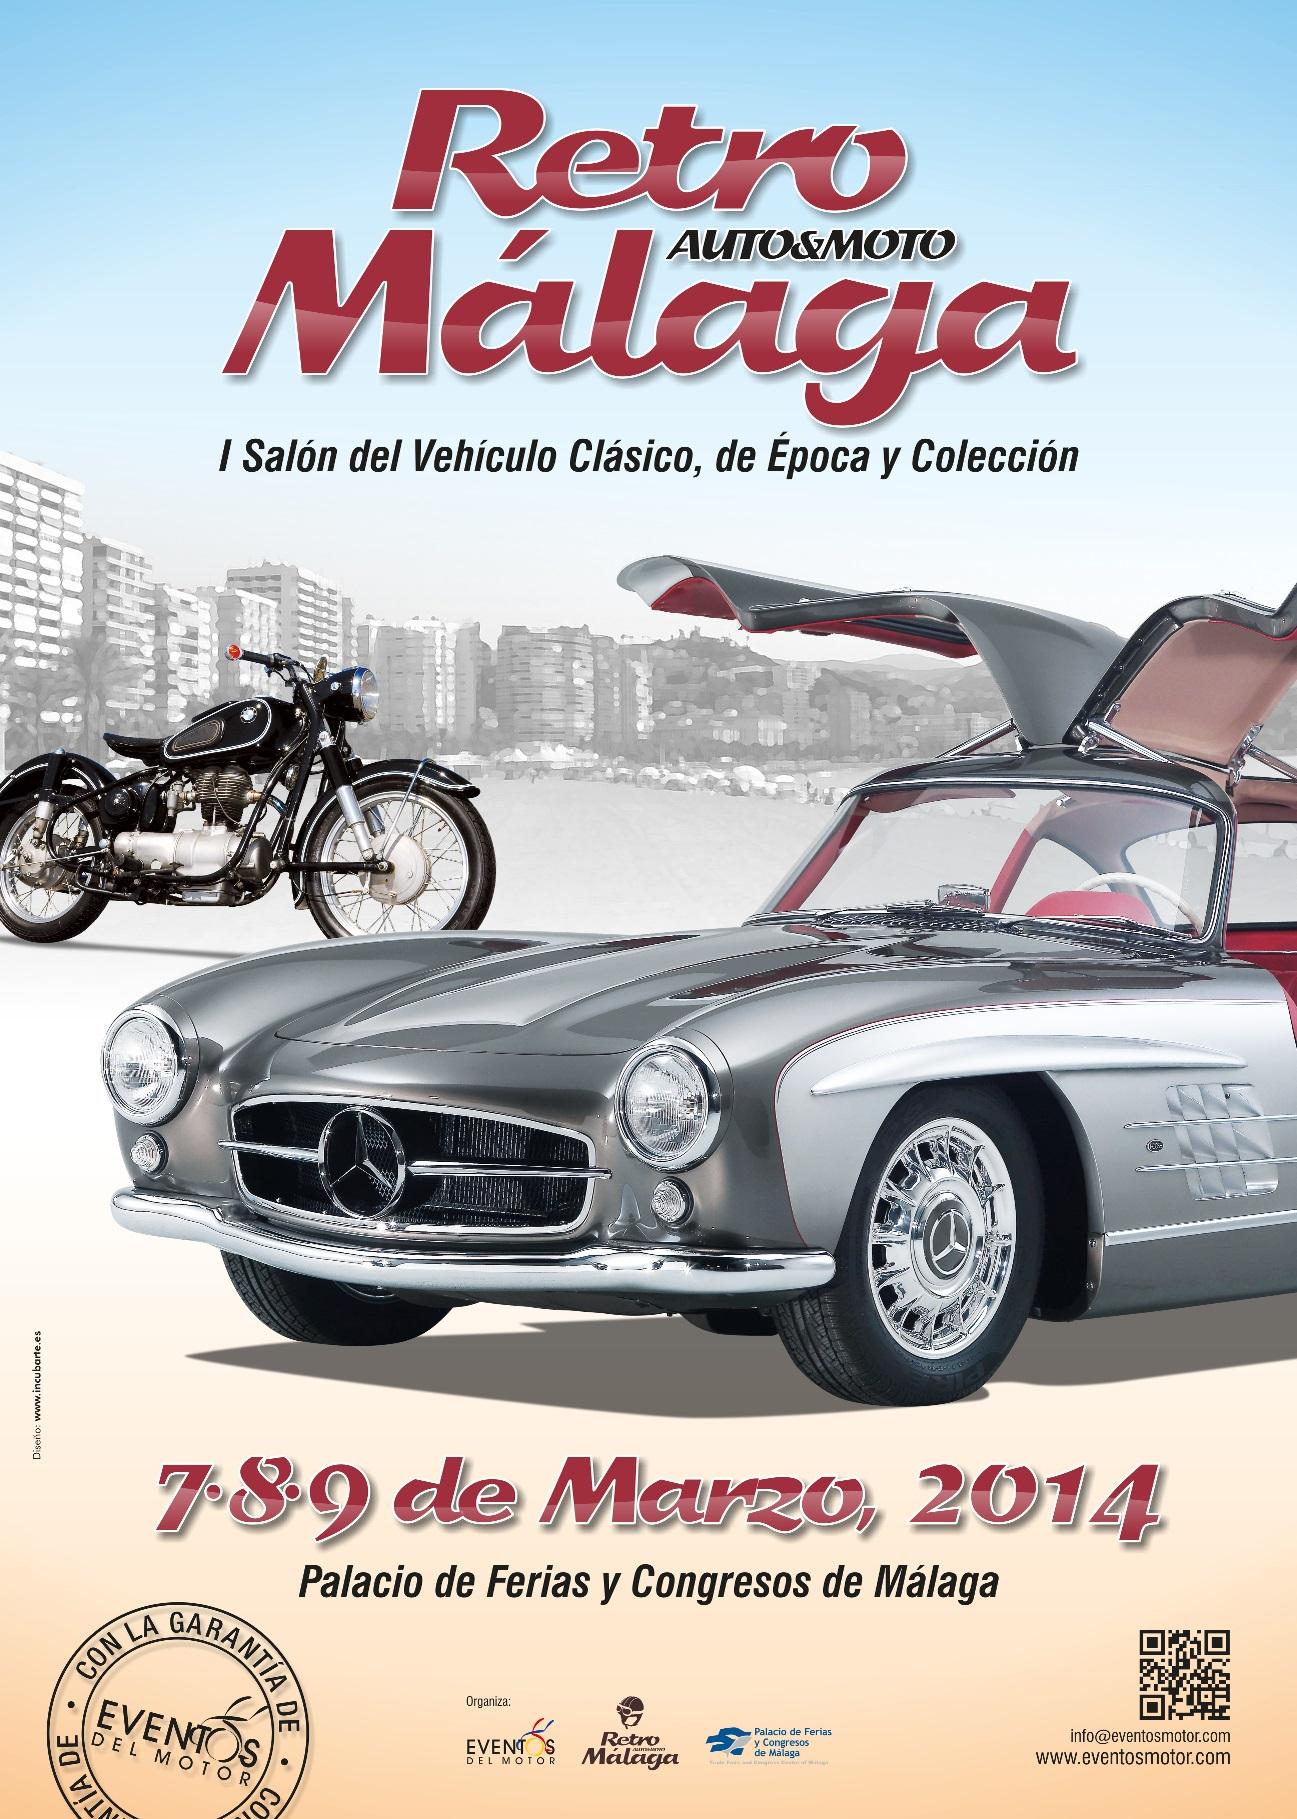 I RETRO AUTO & MOTO MÁLAGA, 7 al 9 de Marzo Feria-Retro-Auto-Moto-M%C3%A1laga